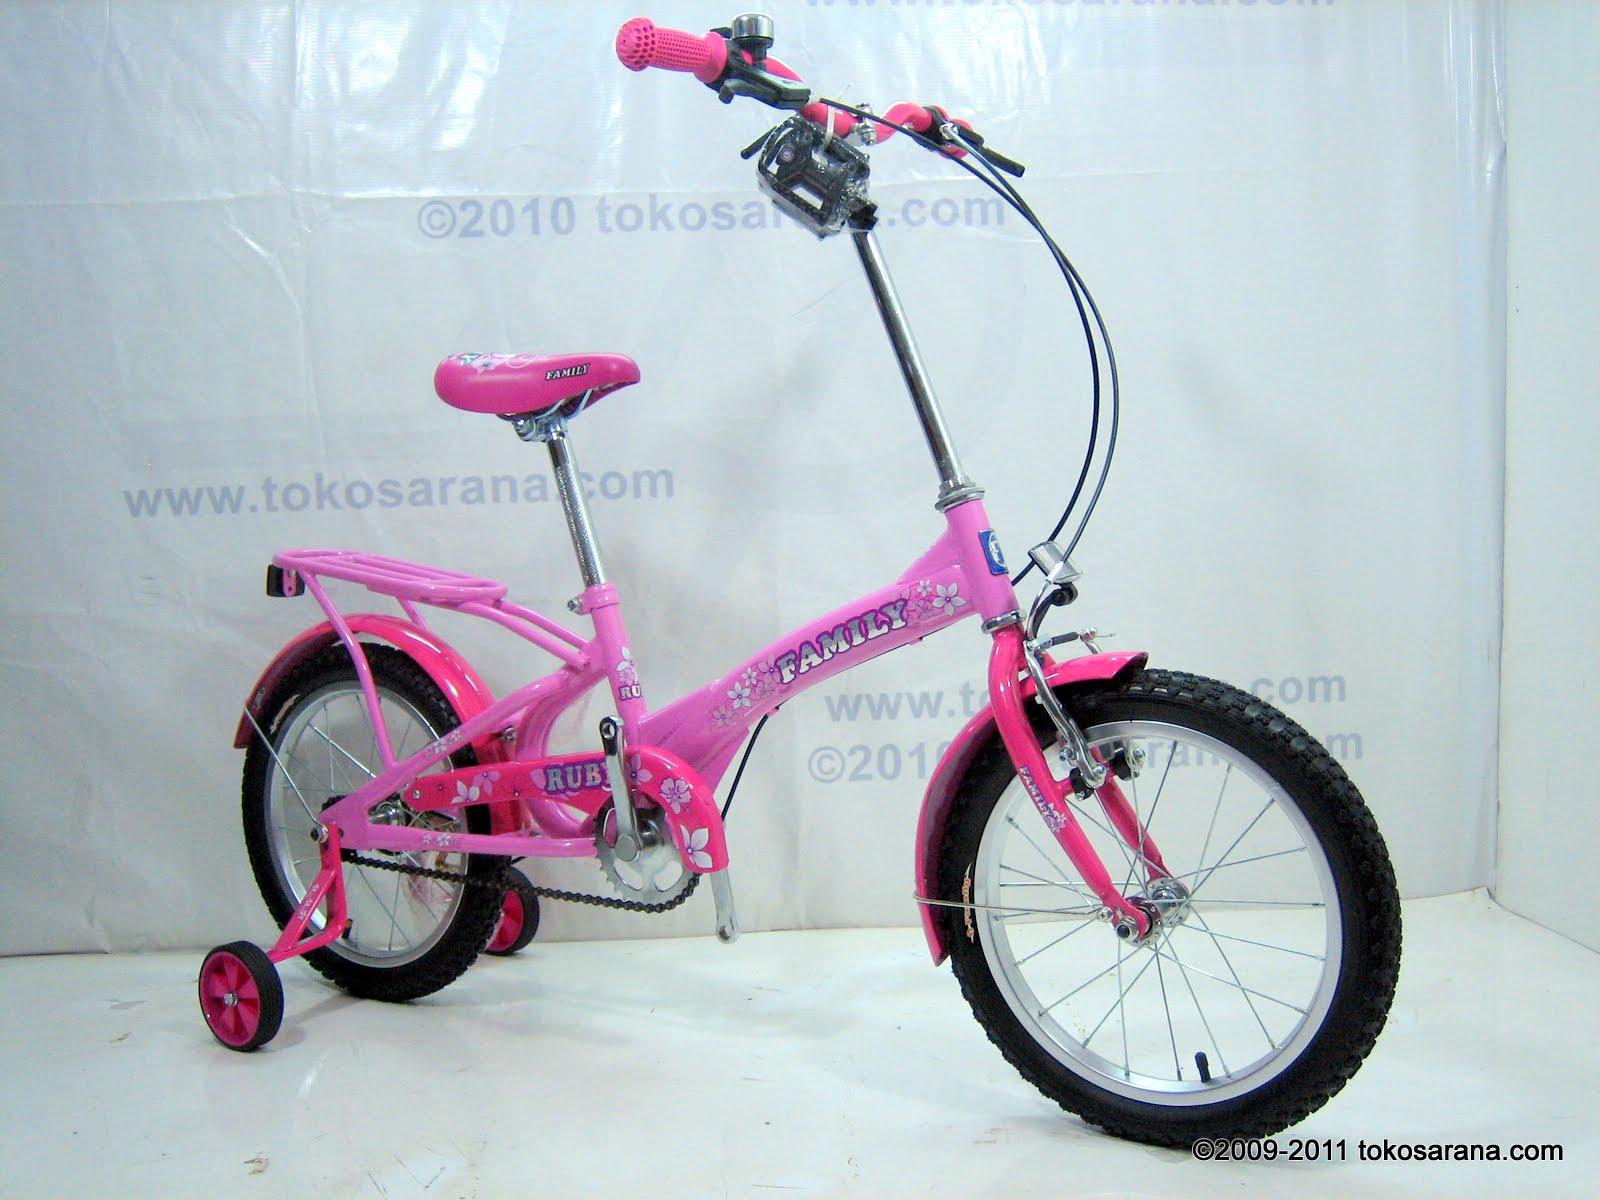 tokomagenta: A Showcase of Products: Sepeda Anak Family